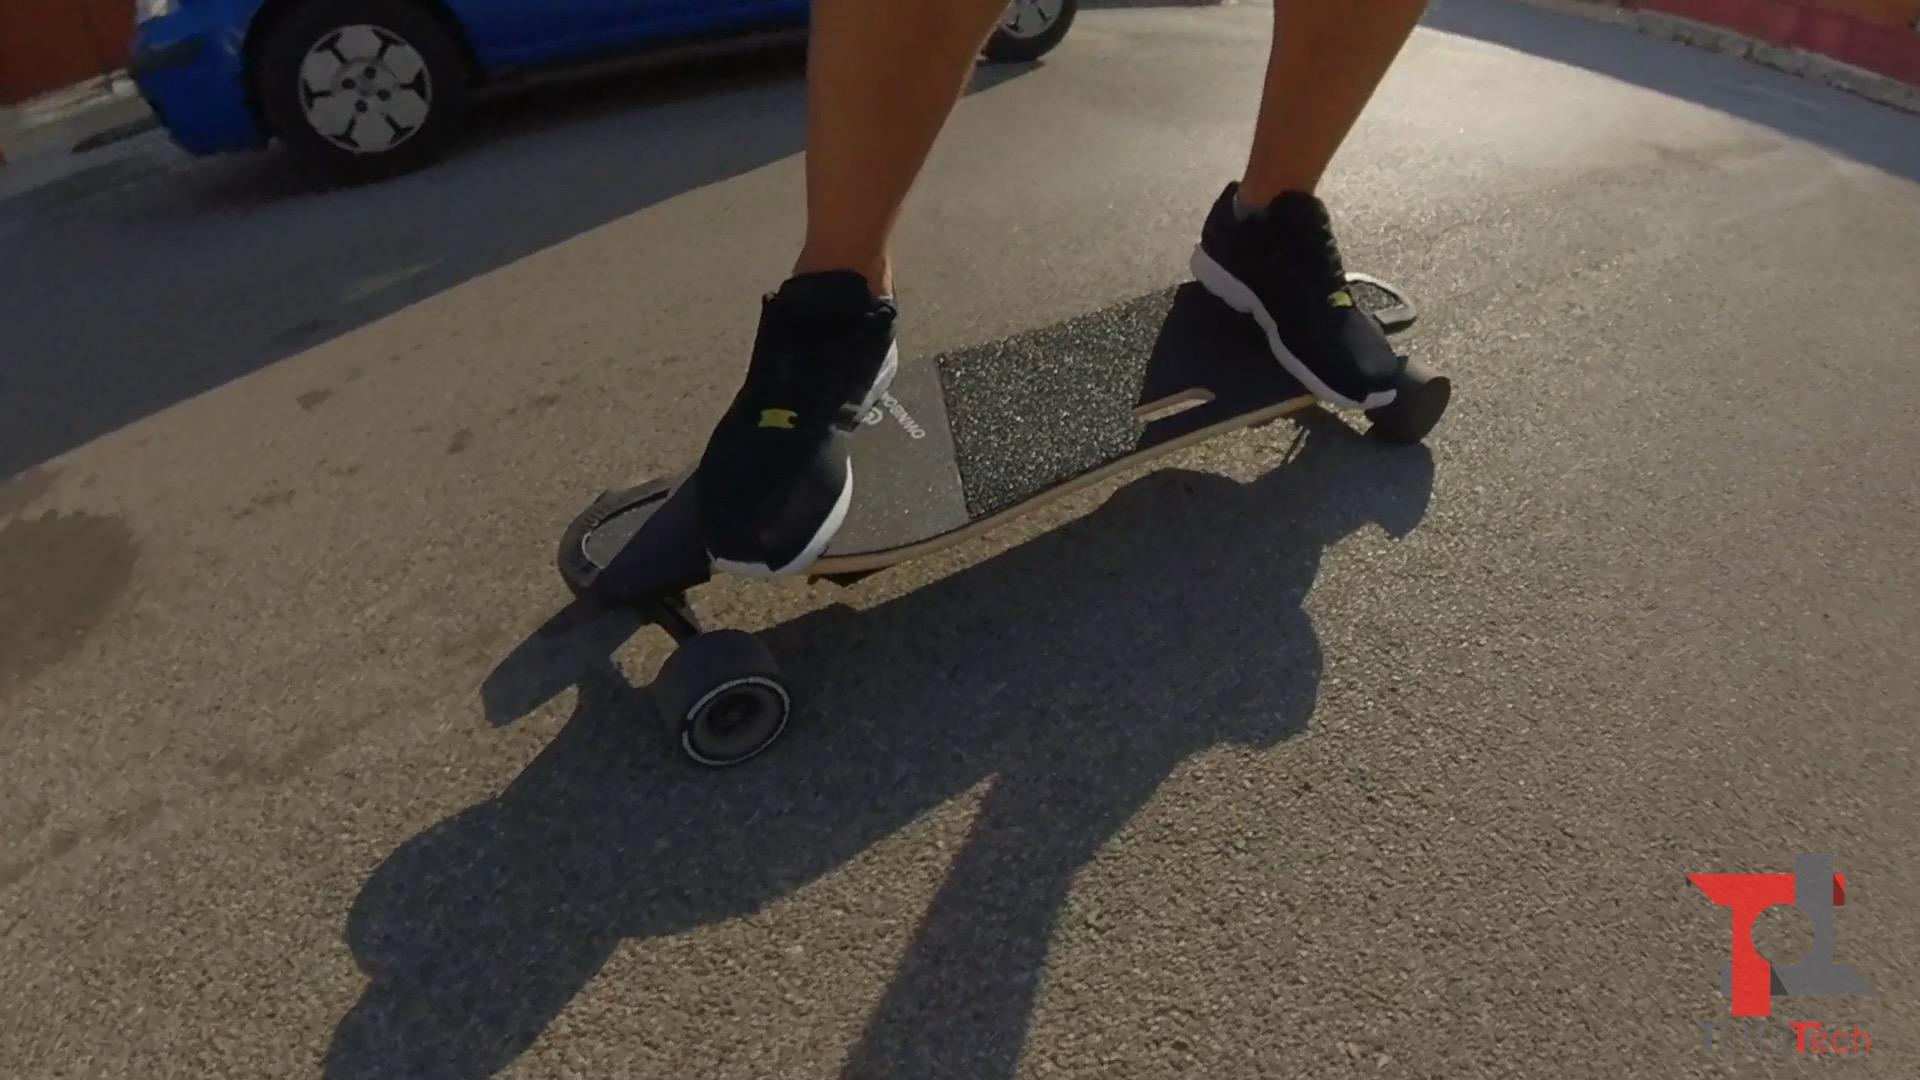 Recensione Ownboard W1S: il best buy degli skateboard elettrici 6